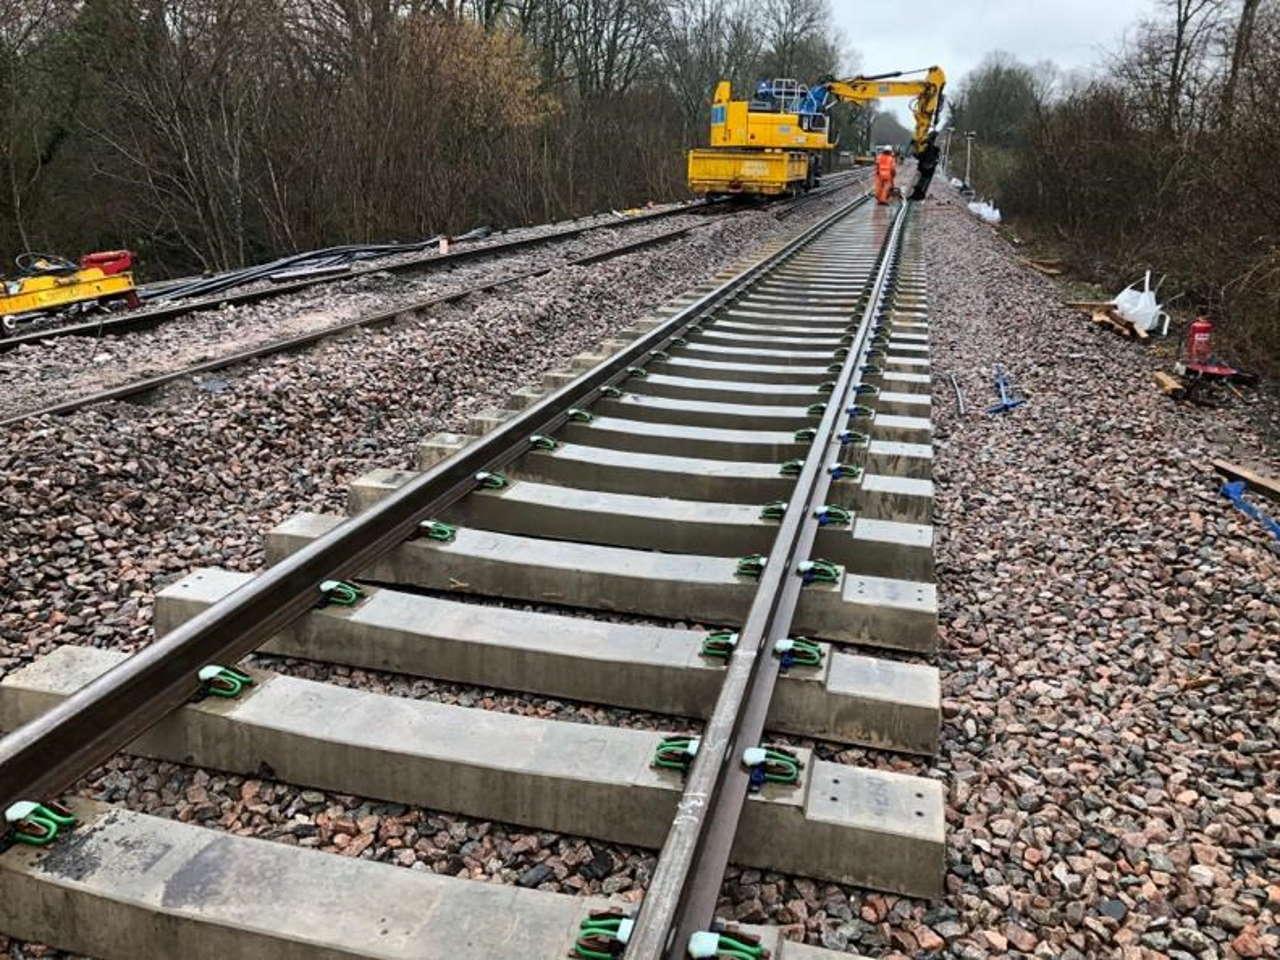 Track laying at edenbridge following a landslip